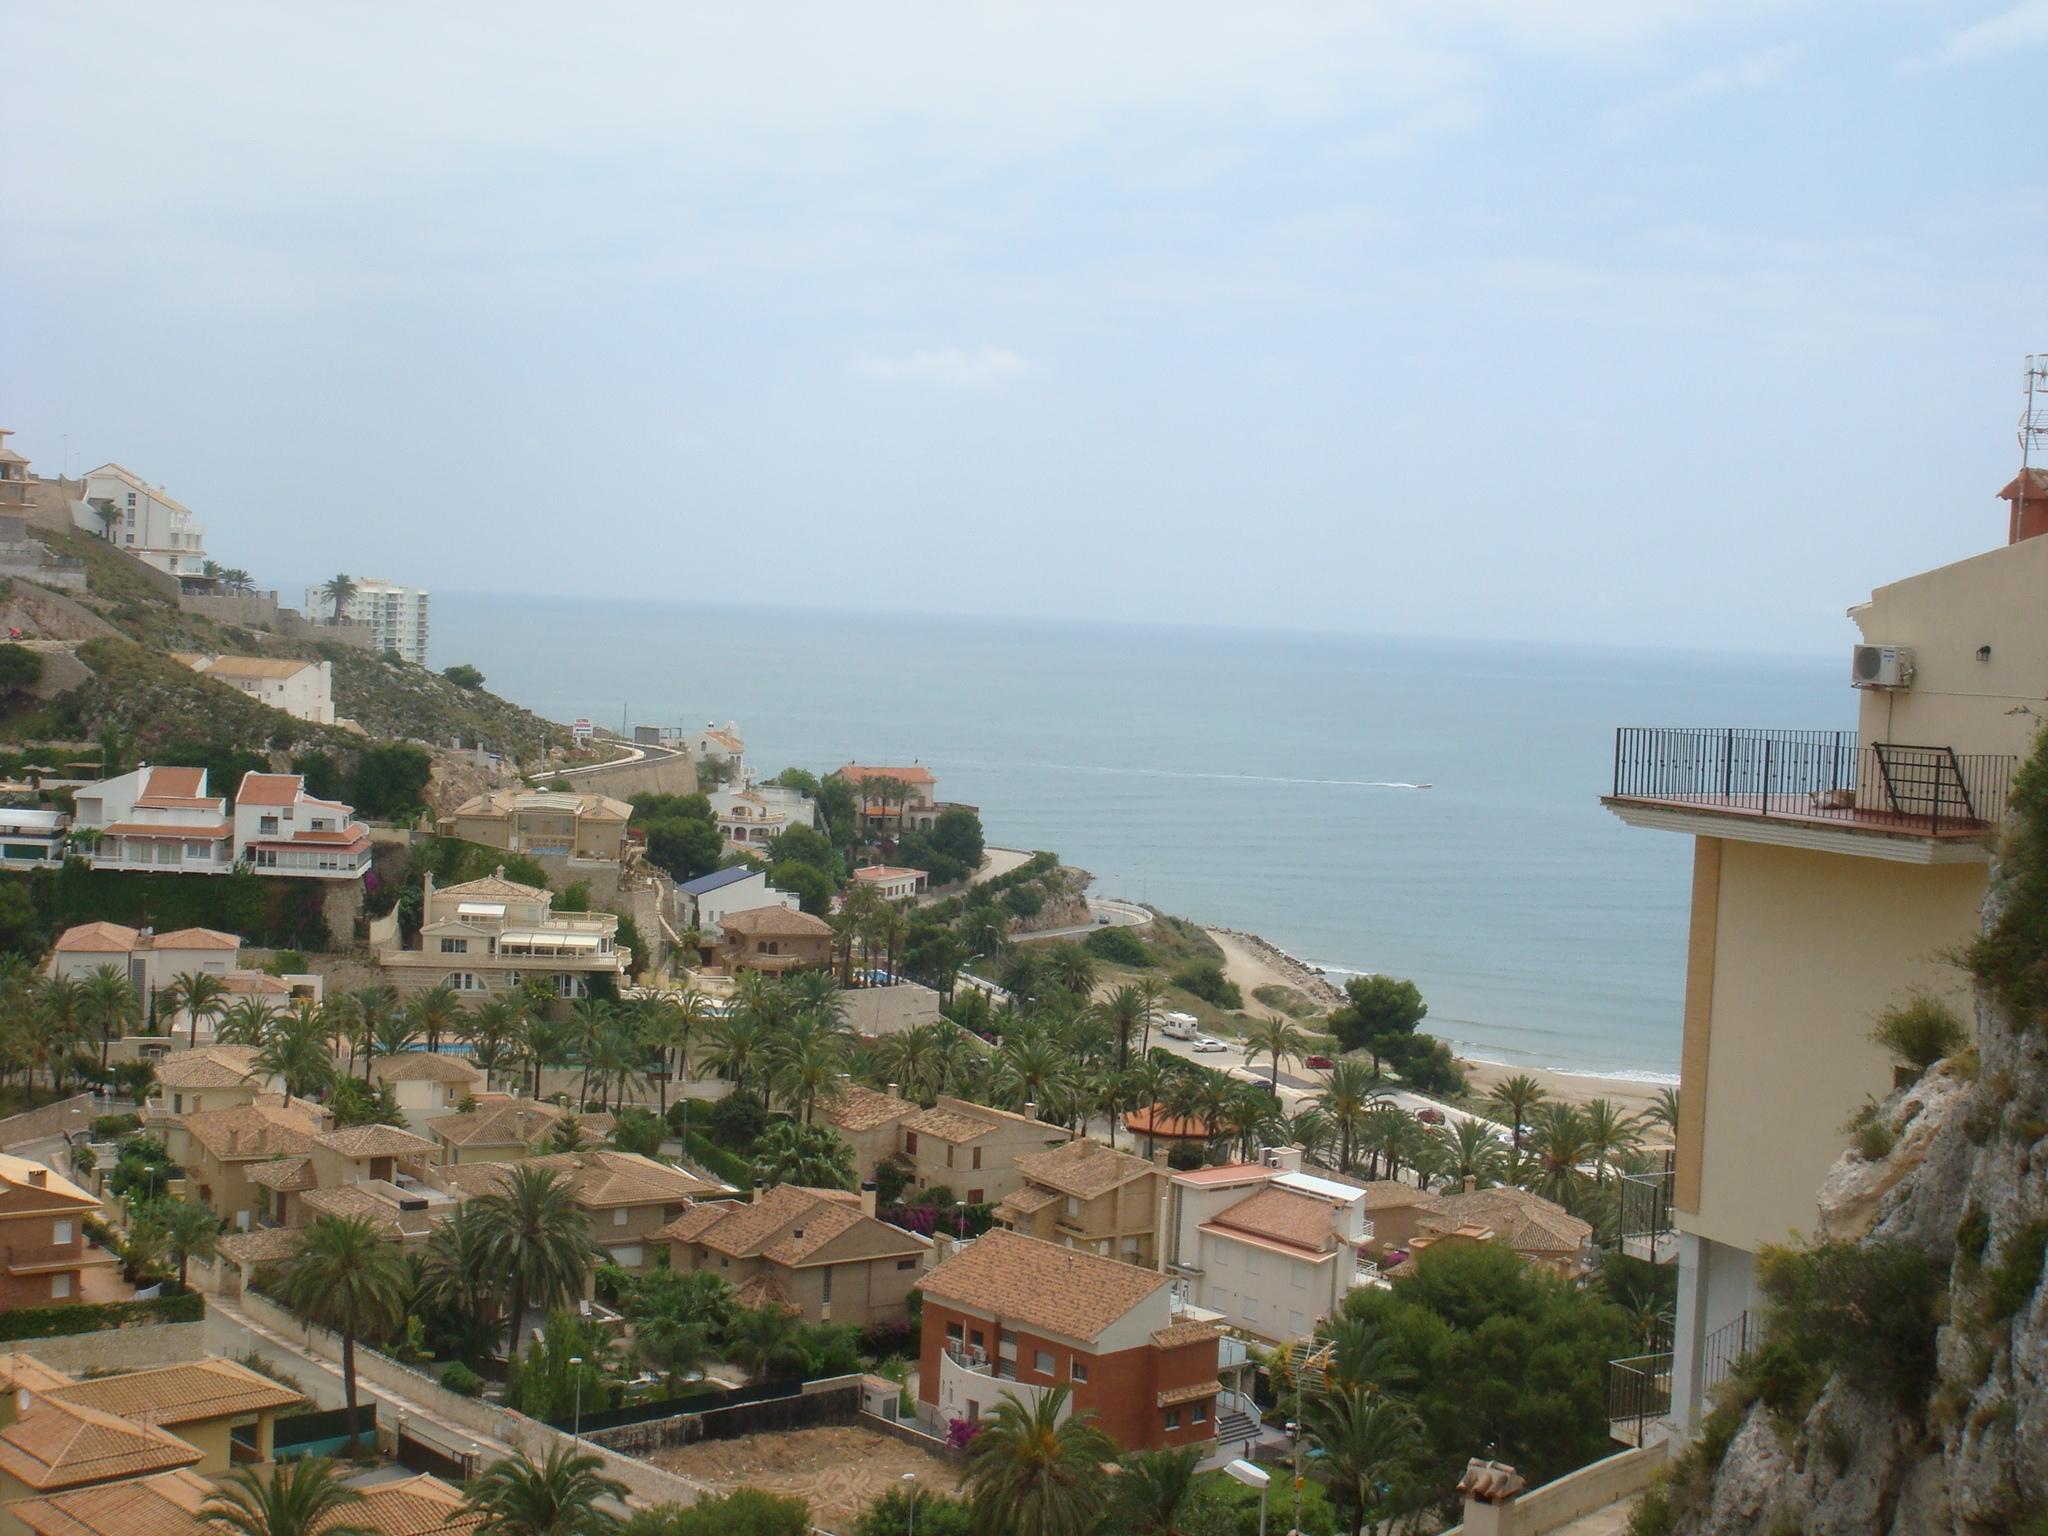 Inmobiliaria gestitur apartamento en zona cap blanc cap blanc 3507 apartamento en zona cap - Venta apartamentos playa cullera ...